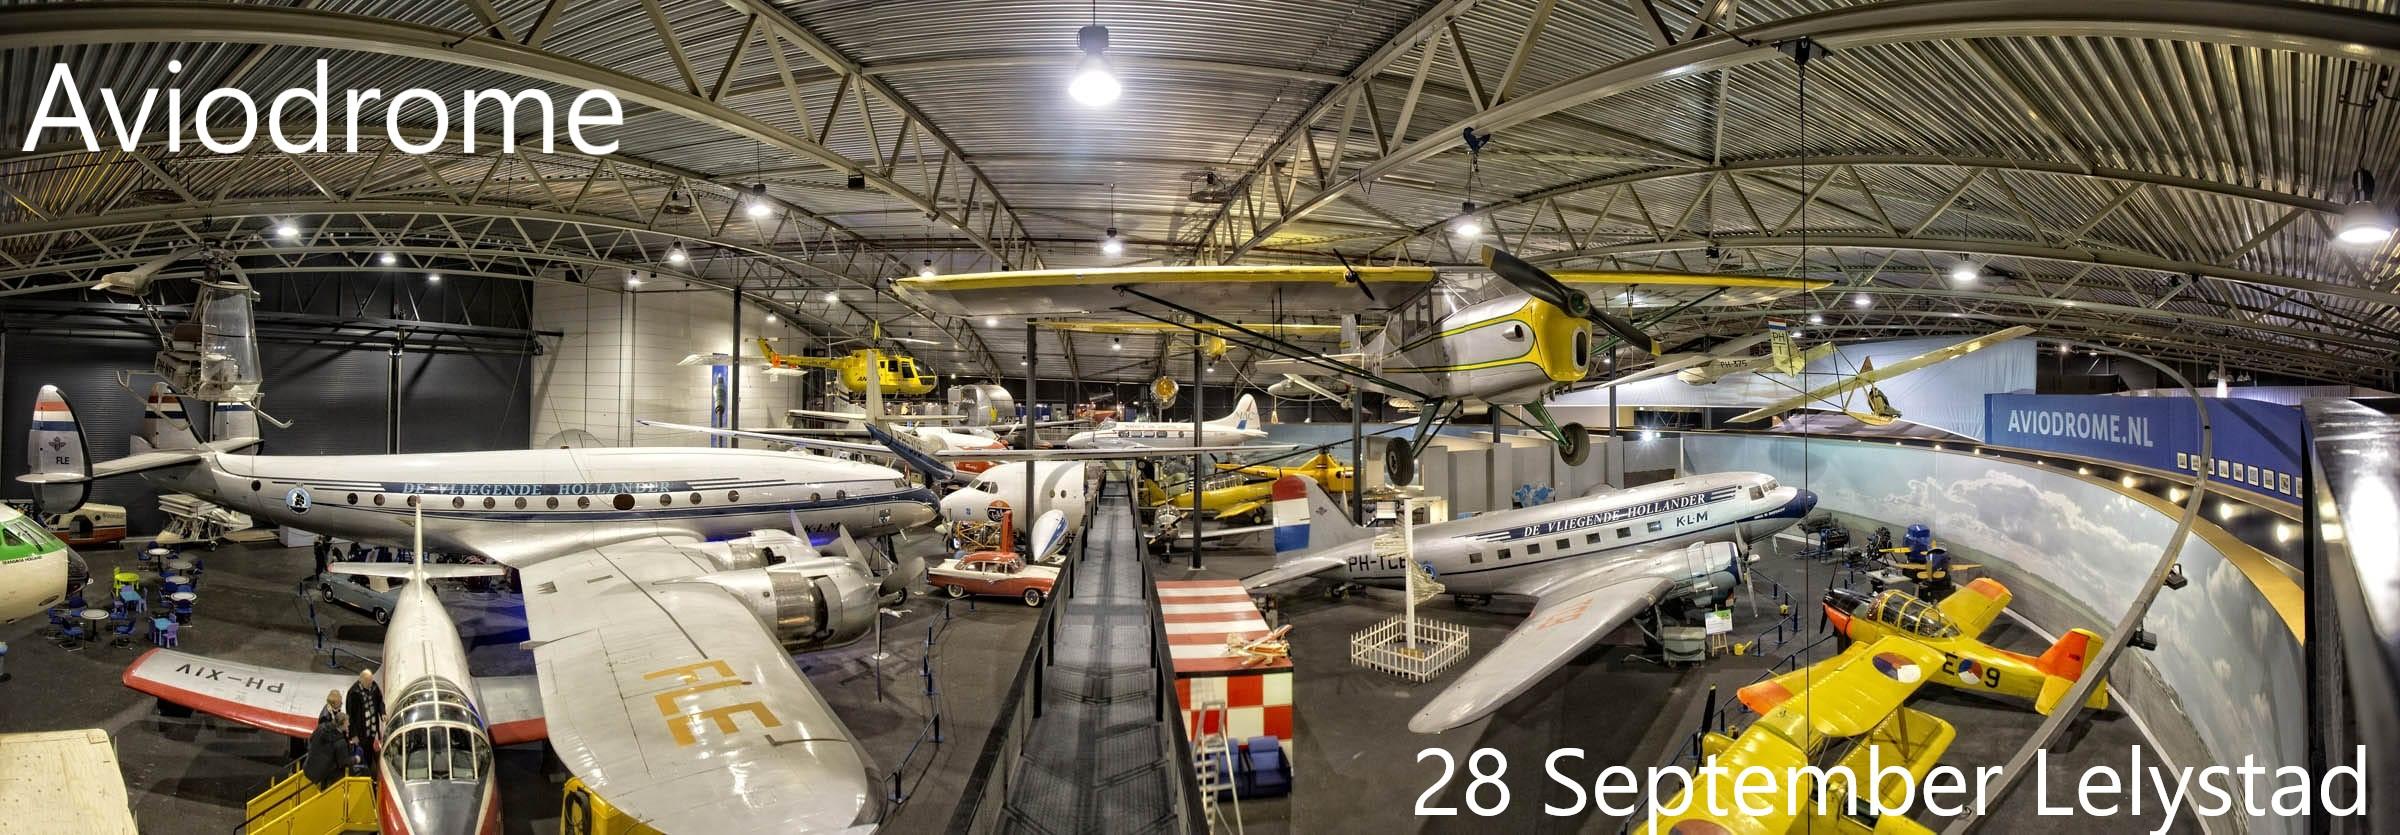 overzicht-hangar-aviodrome-lelystad-airport-2.jpg